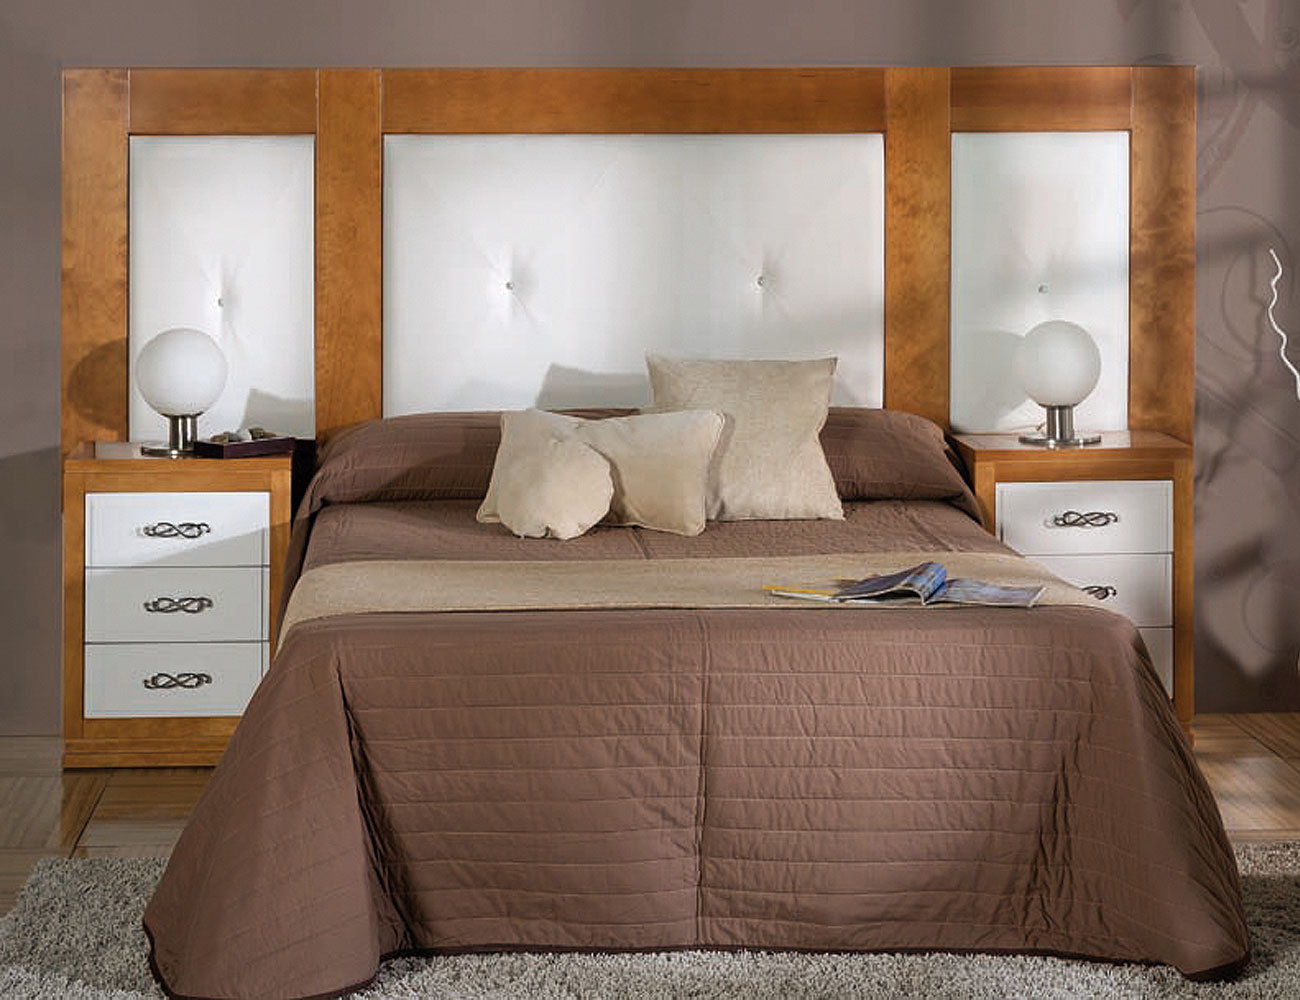 Composicion49 dormitorio matrimonio cabecero beas tapizado mesita